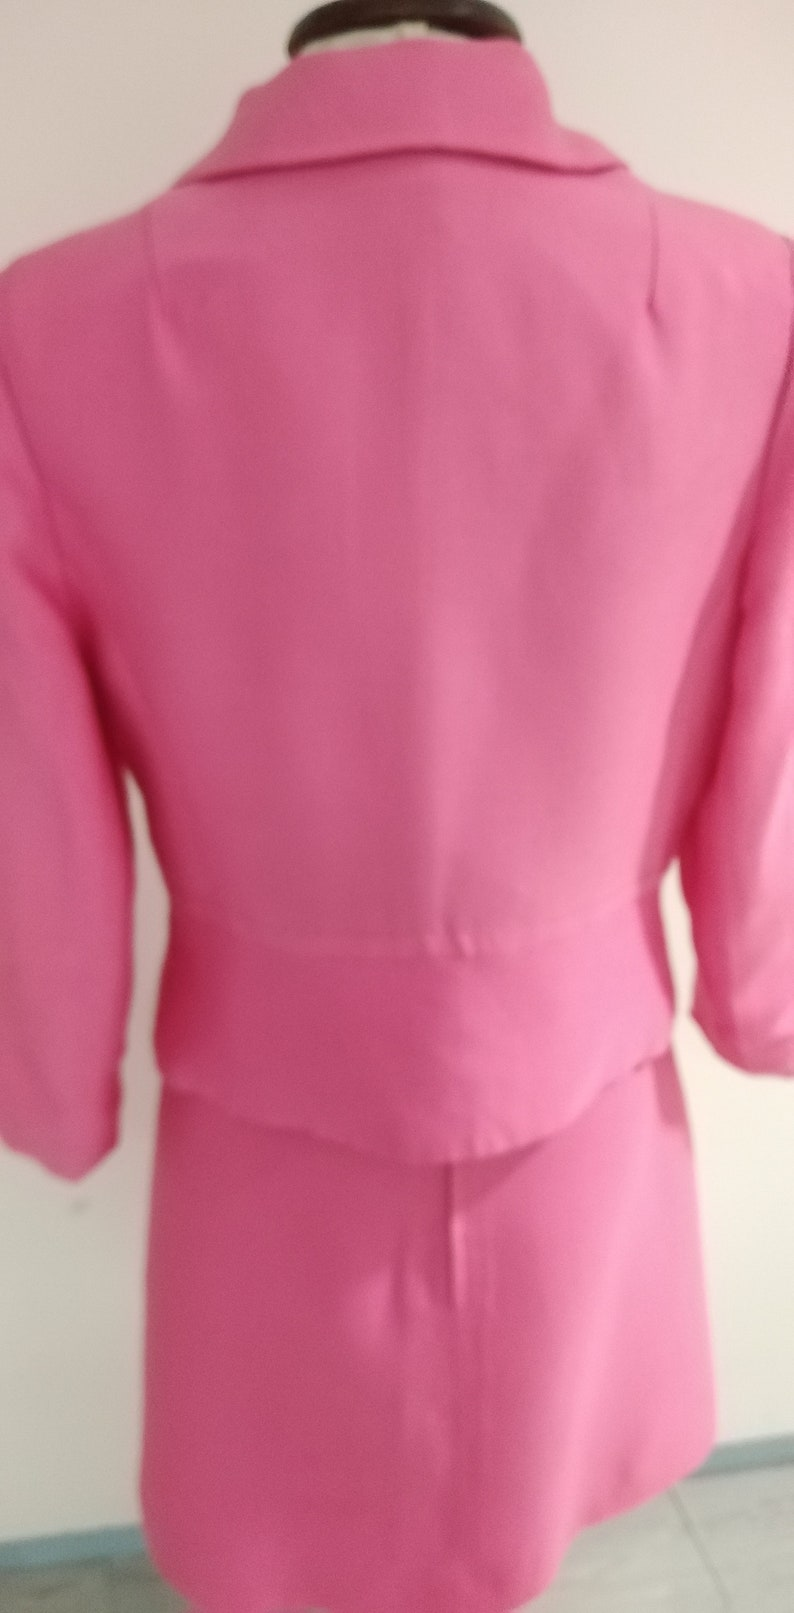 Vintage 60s Peter Barron Pink Dress and Jacket Suit